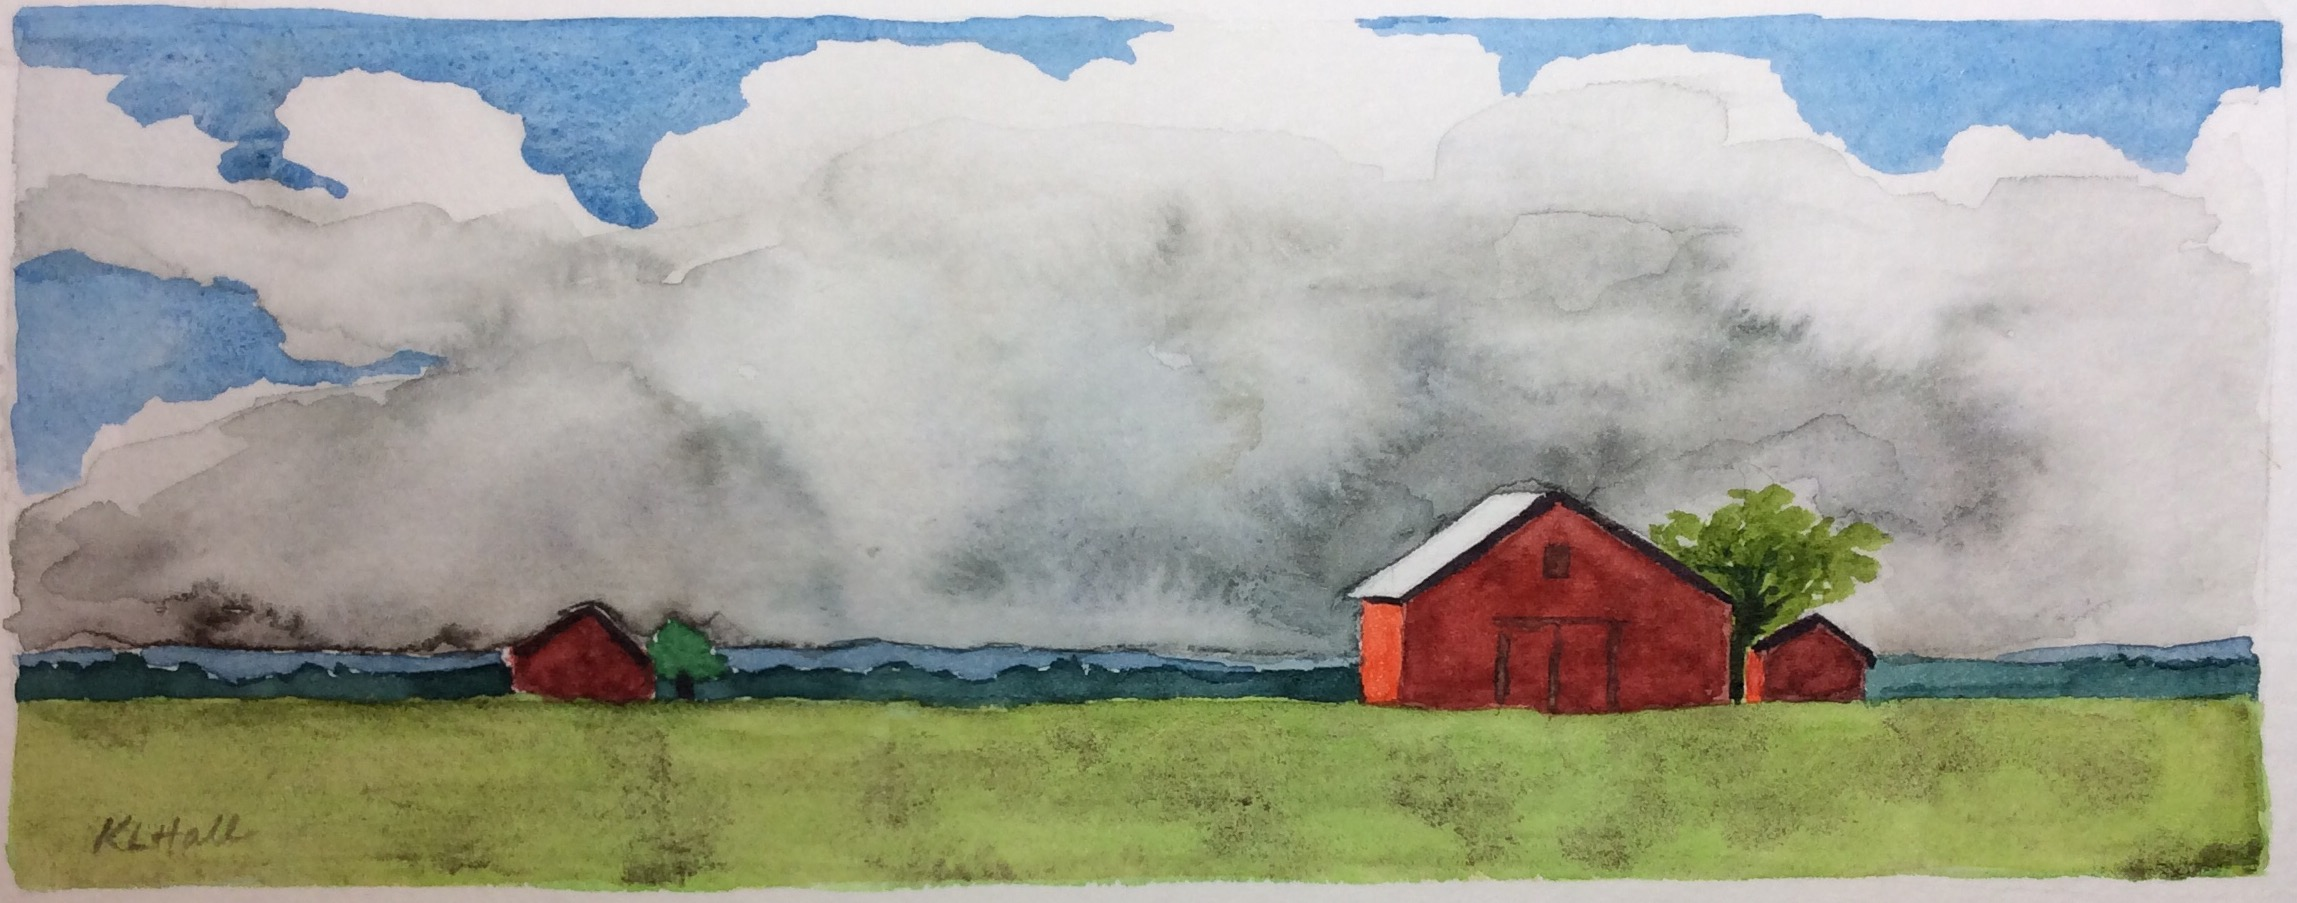 Notecard, watercolour